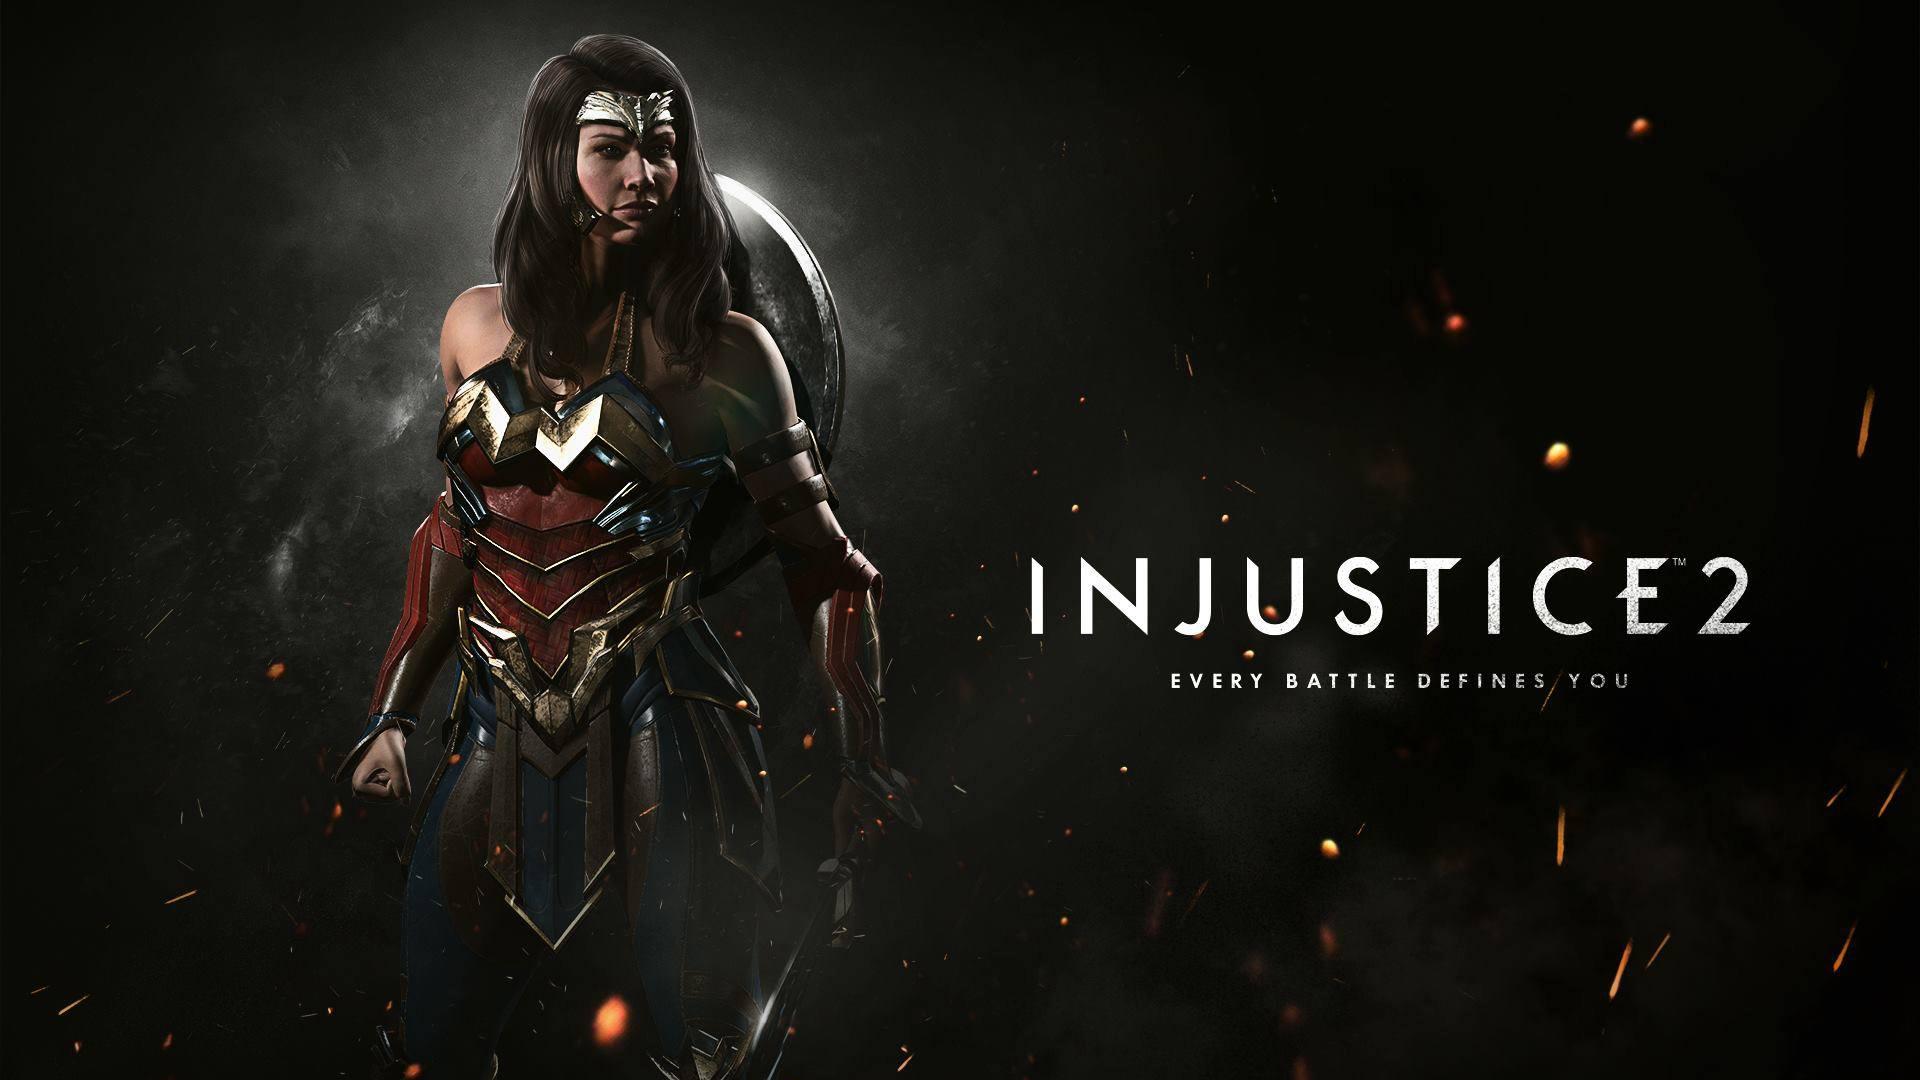 Free Download Injustice 2 Hd Wallpaper 7 1920 X 1080 Stmednet